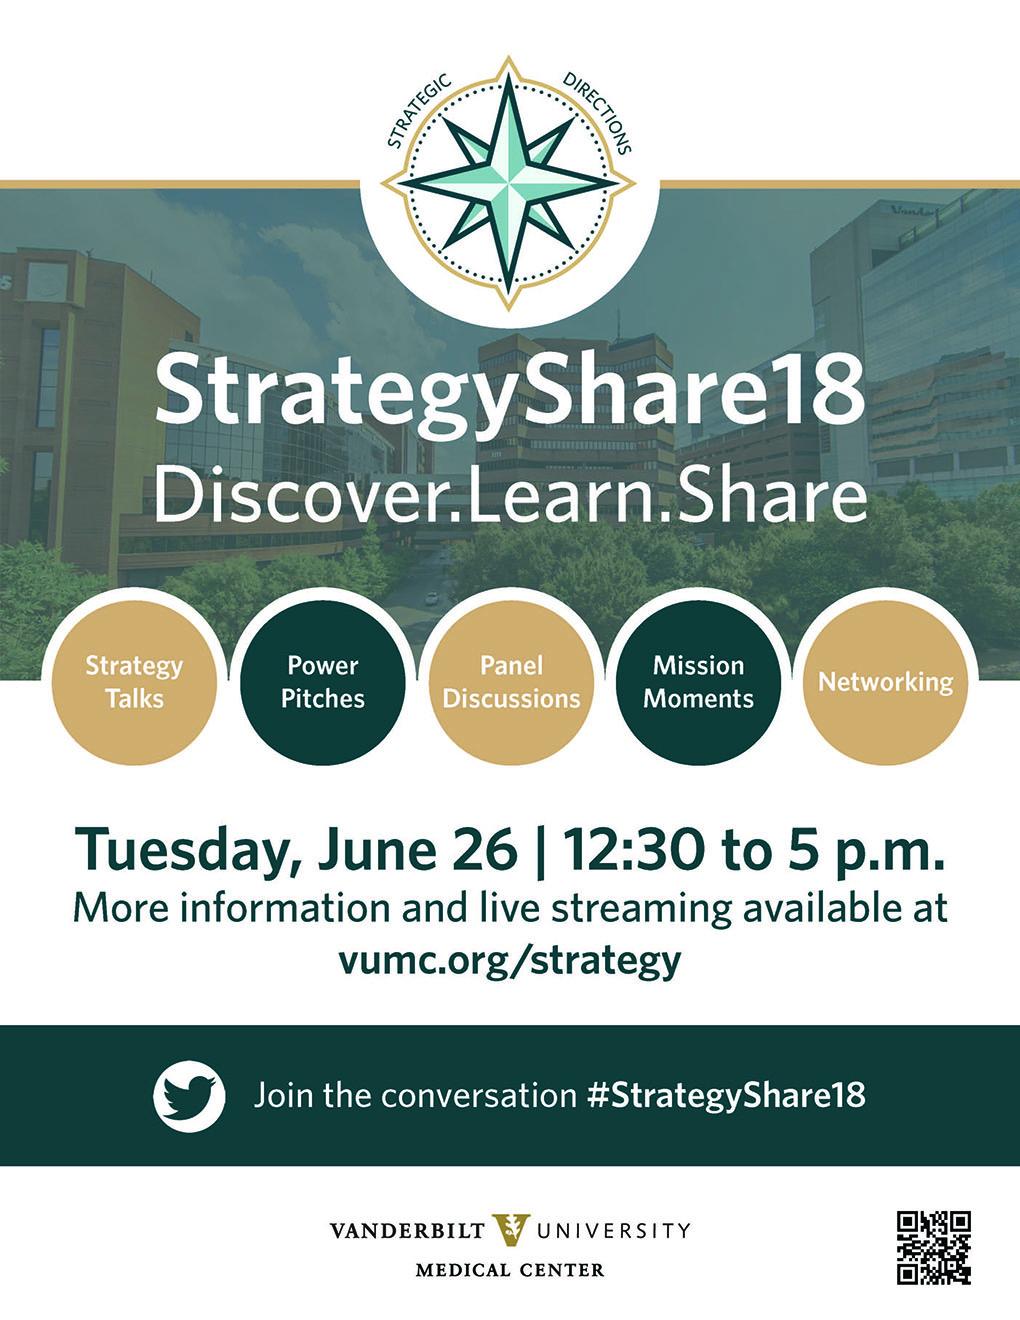 StrategyShare18 Flyer_Reporterv2_0.jpg